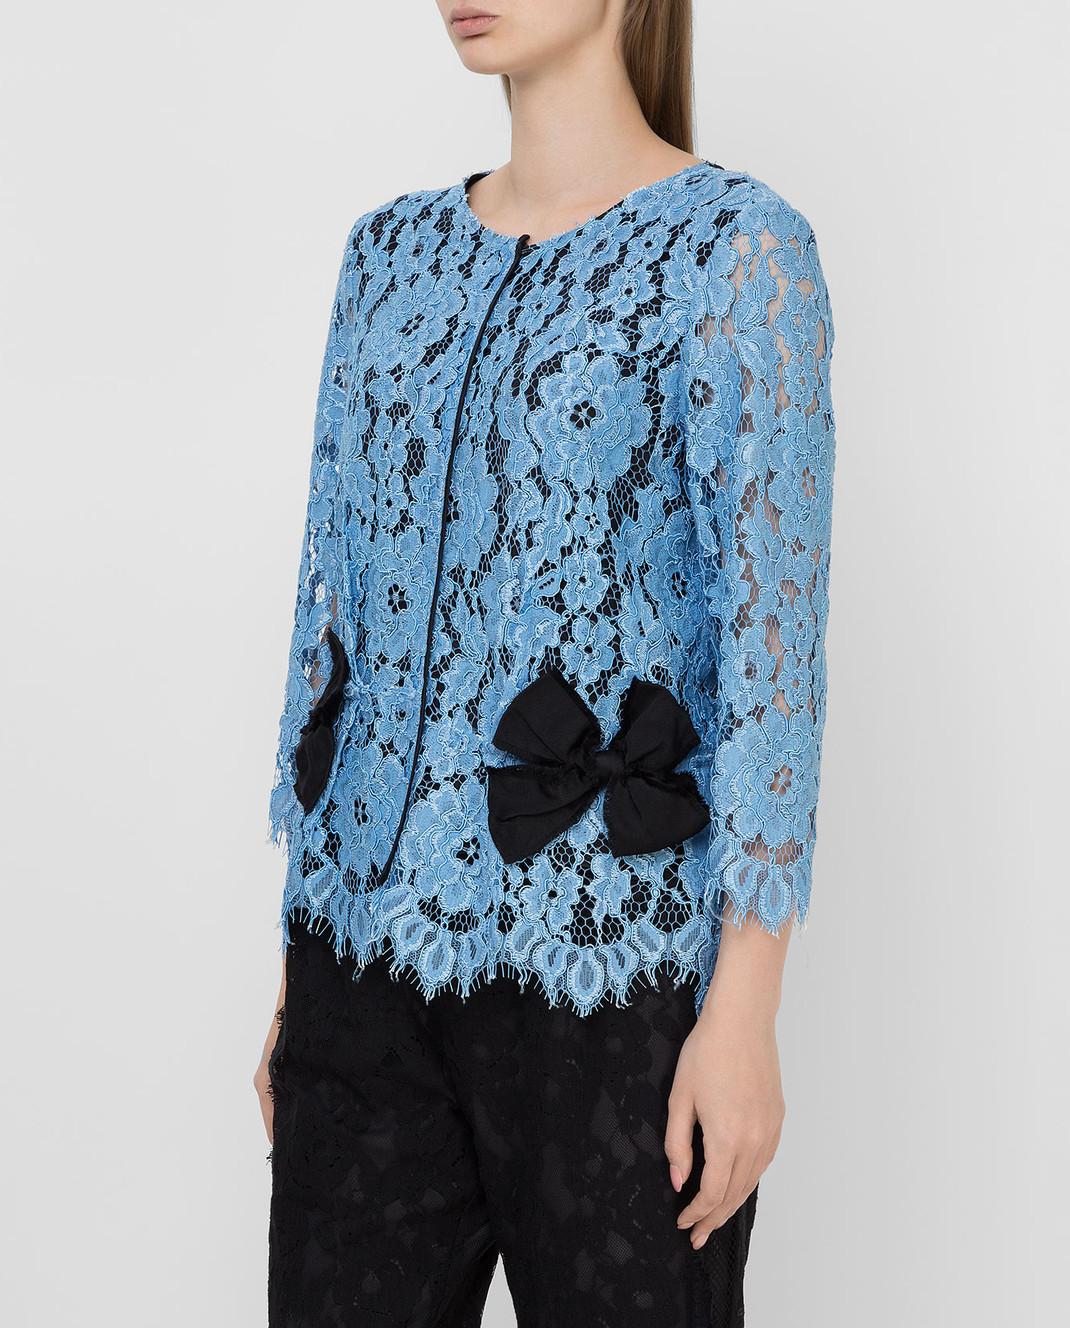 Marc Jacobs Голубая блуза M4005733 изображение 3